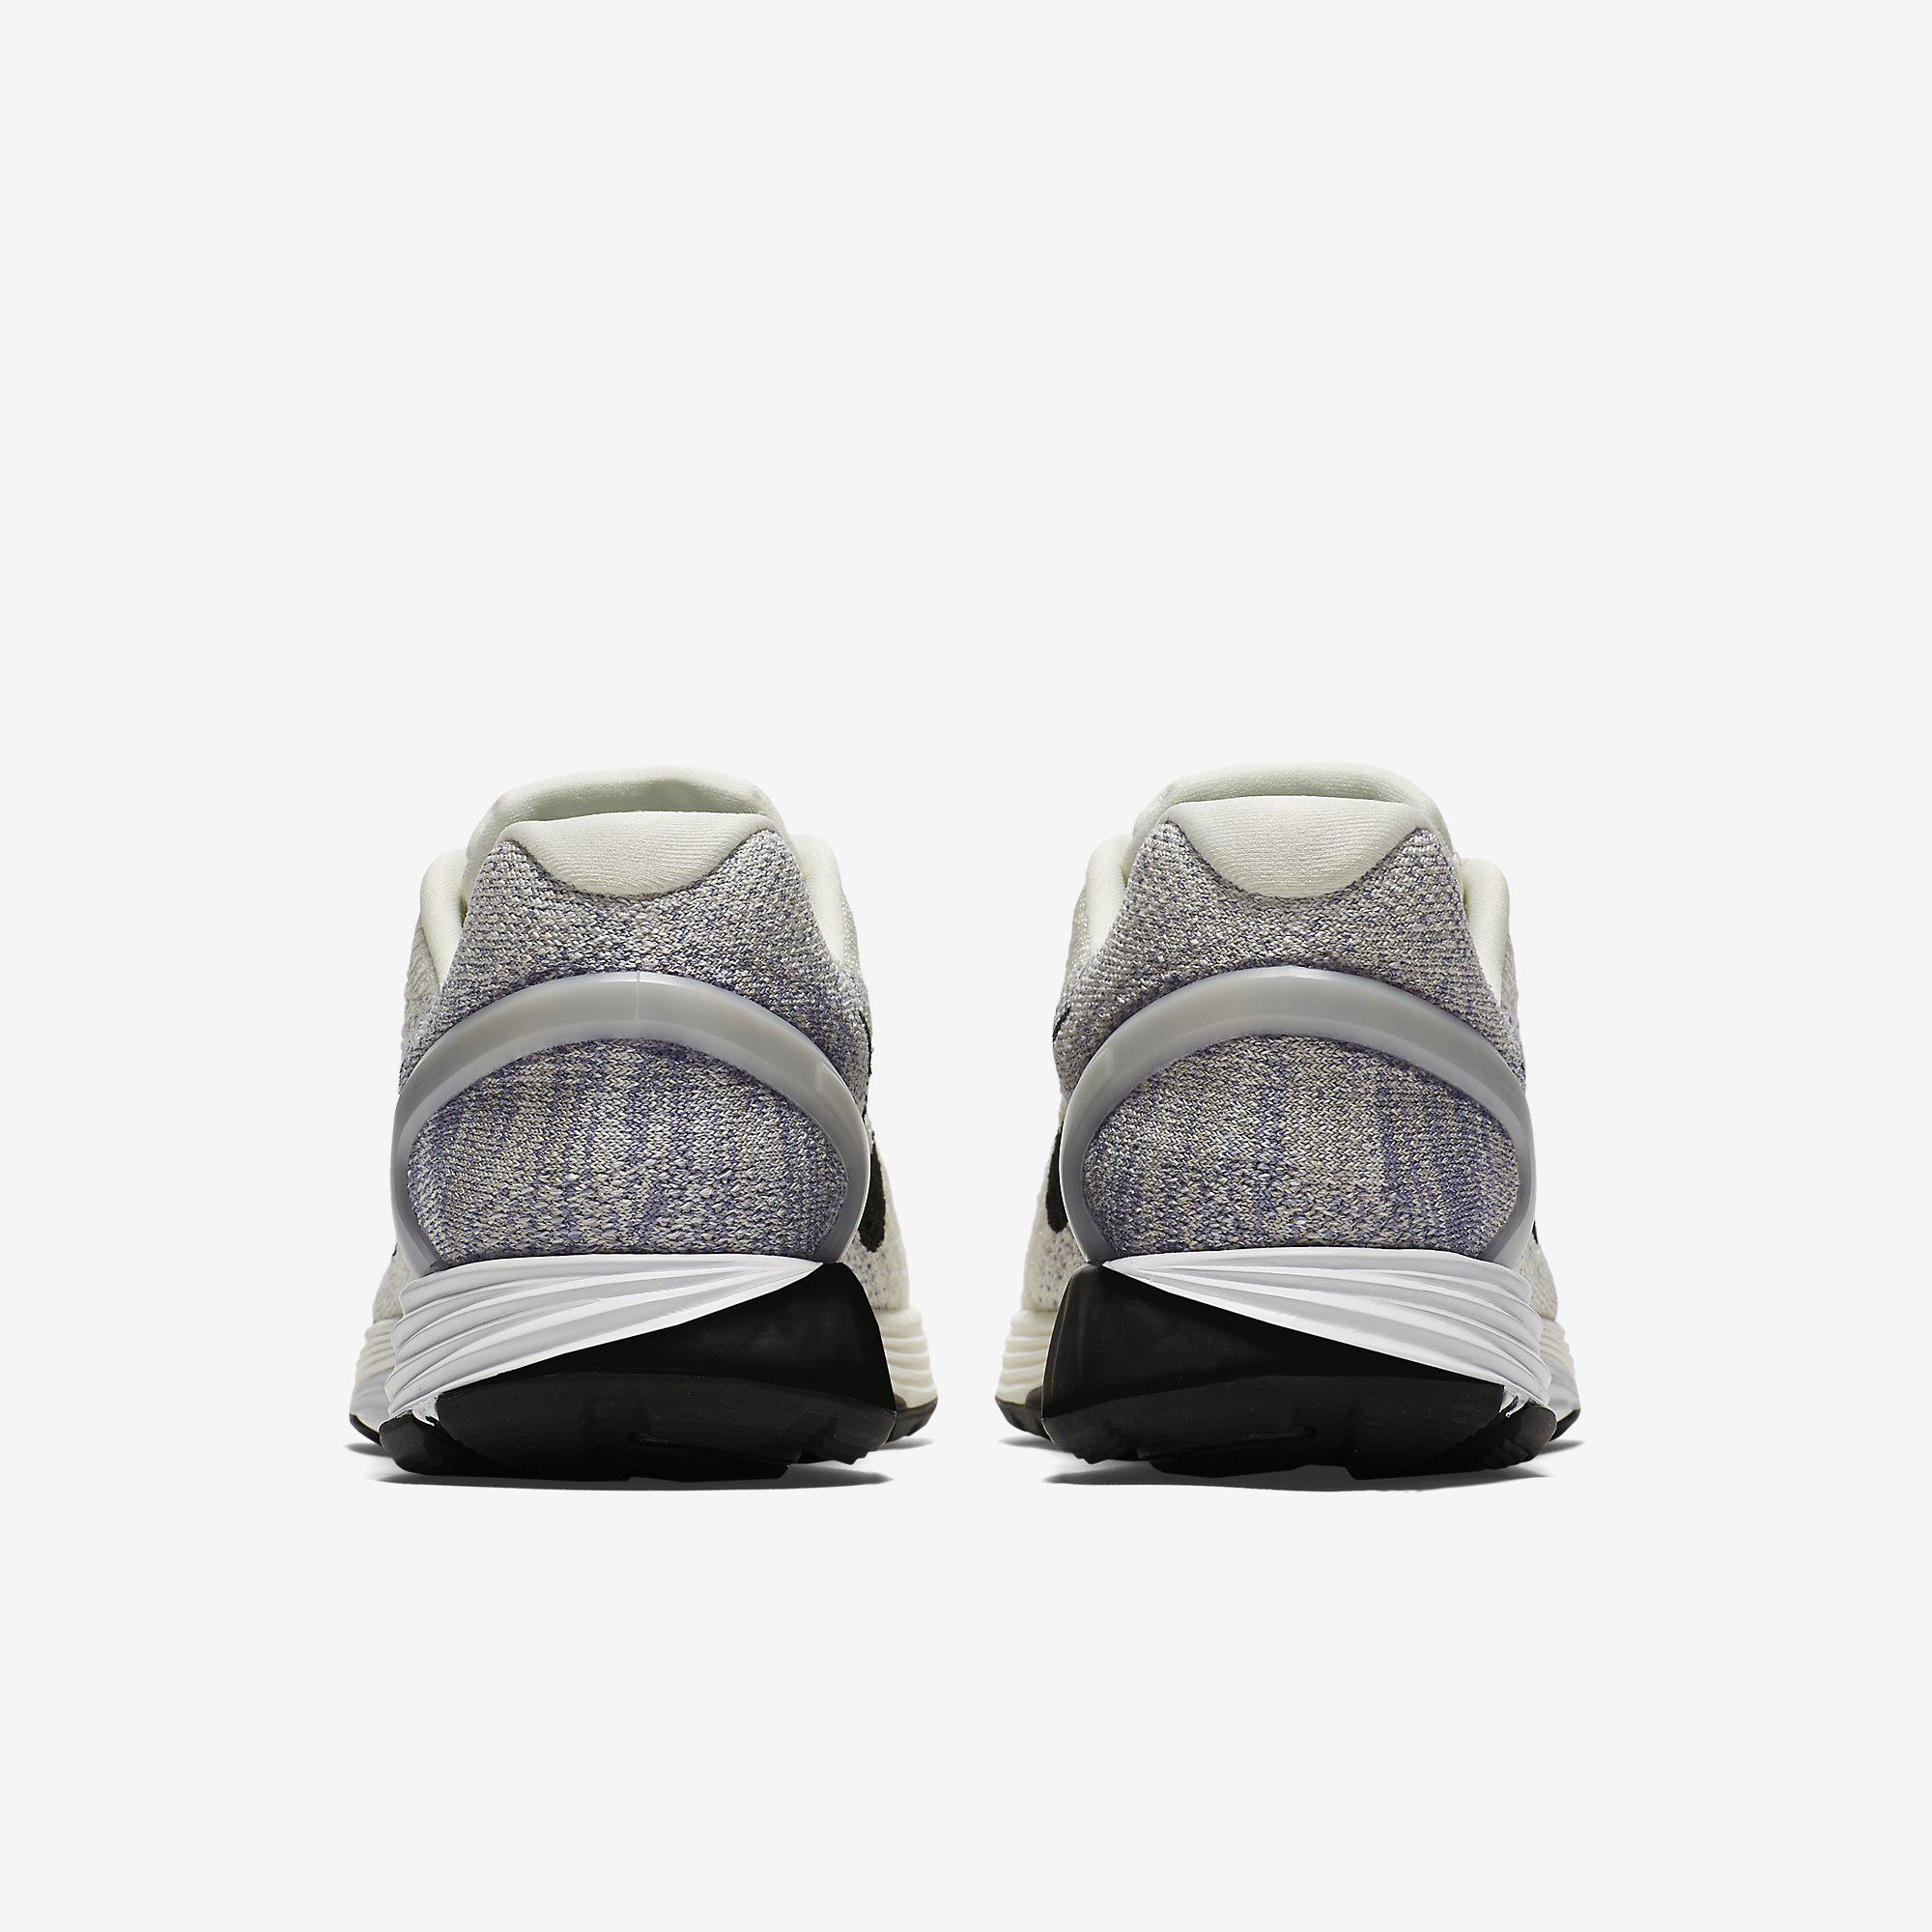 wholesale dealer 3ef34 bb625 Nike Womens LunarGlide 7 Running Shoes - White